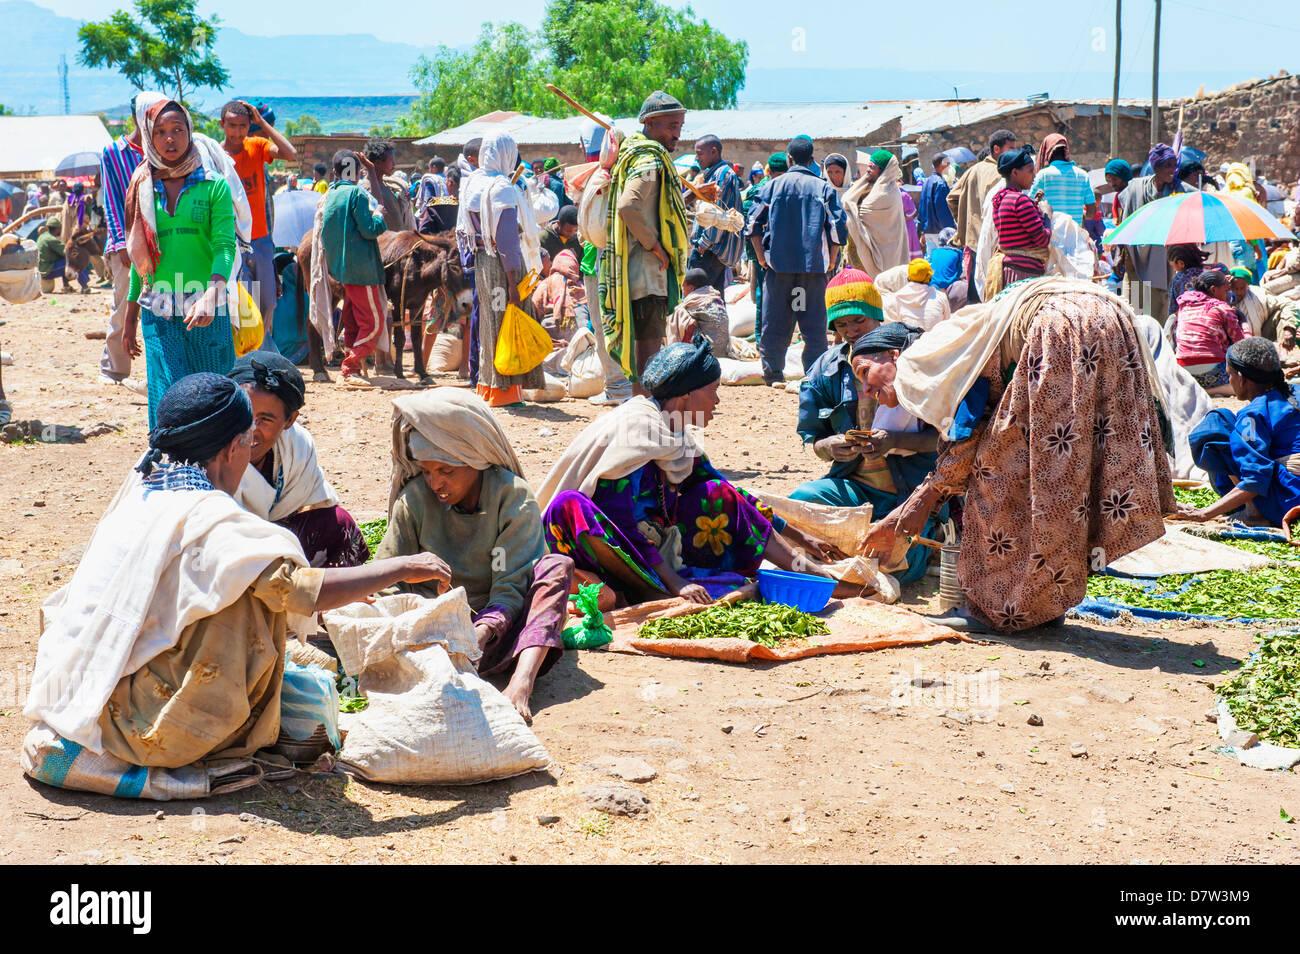 Women selling vegetables, Lalibela market, Amhara region, Northern Ethiopia - Stock Image